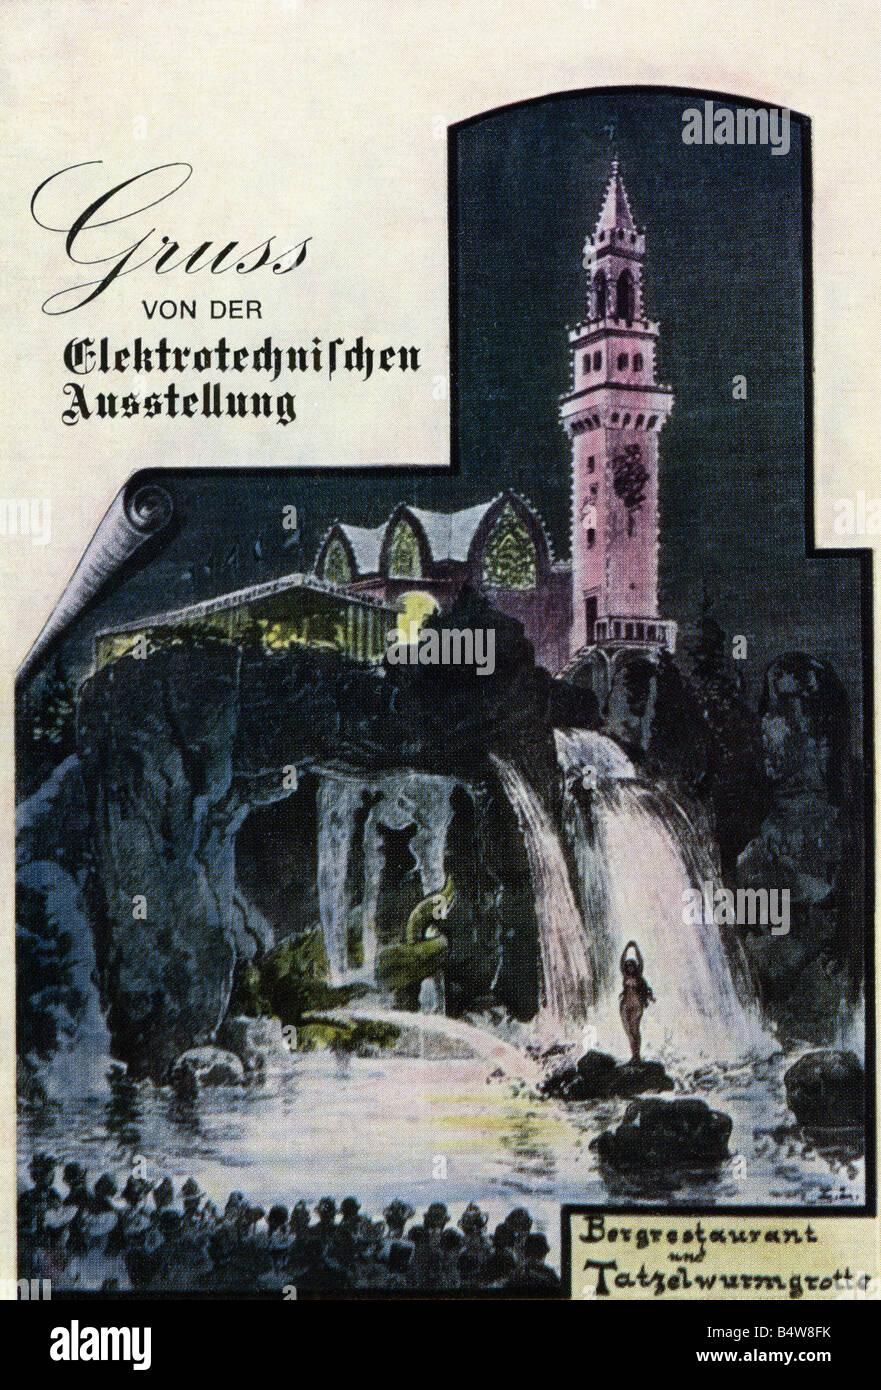 exhibitions, industry, International Electro-Technical Exhibition, Frankfurt am Main, 16.5.1891 - 19.10.1891, postcard, - Stock Image